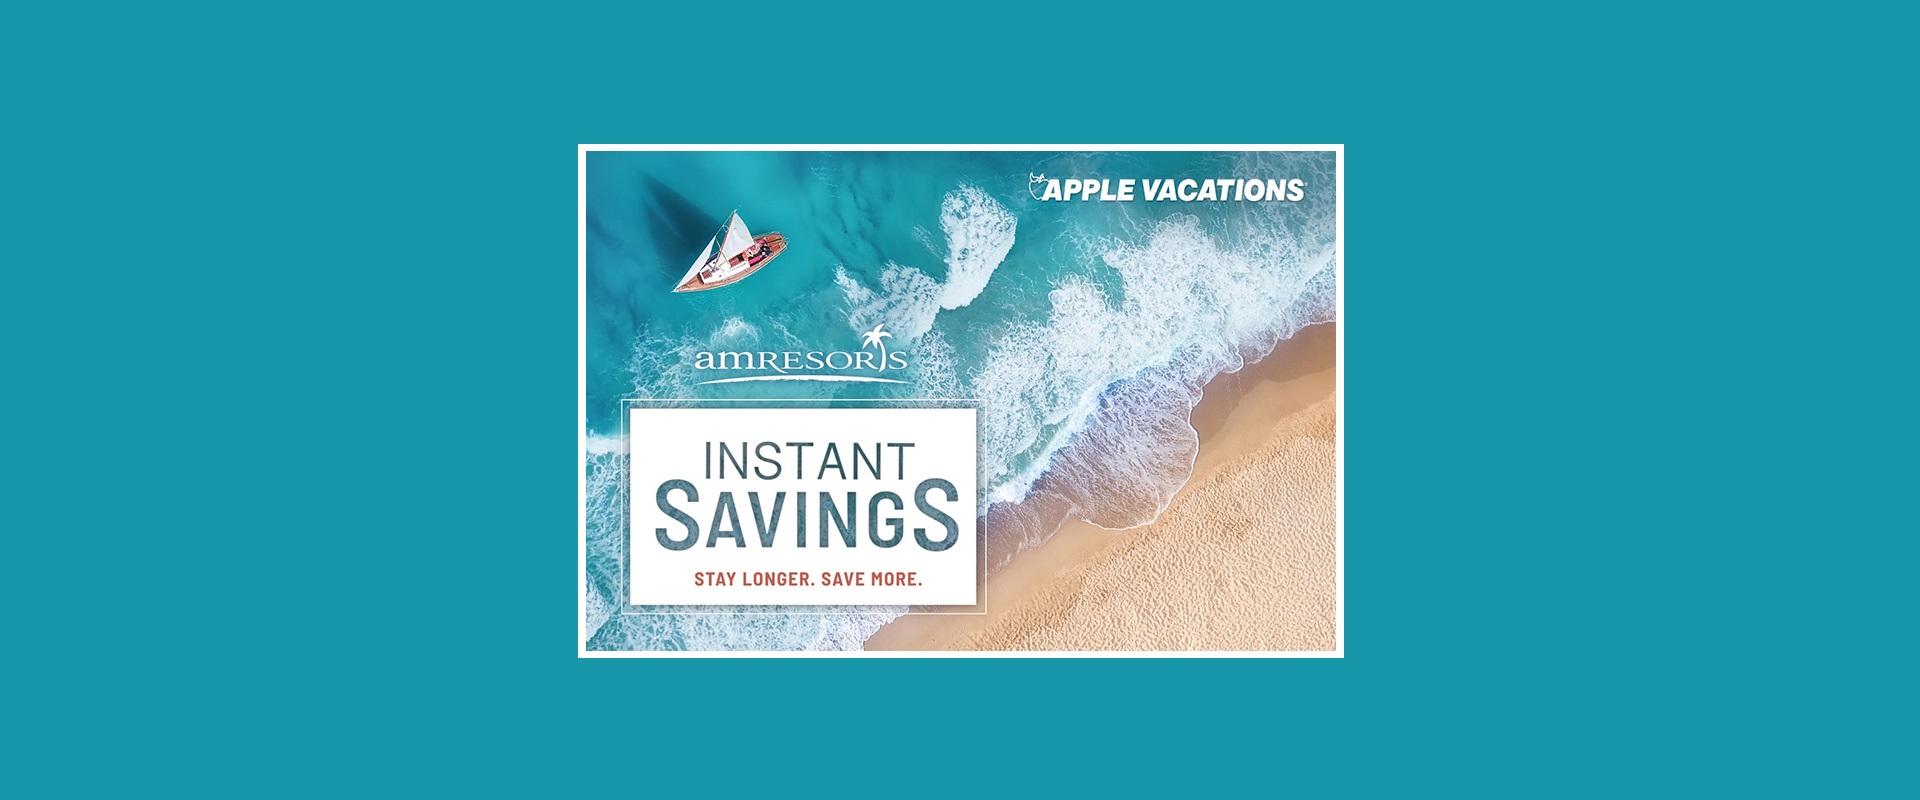 AM-Resorts-Instant-Savings-Banner